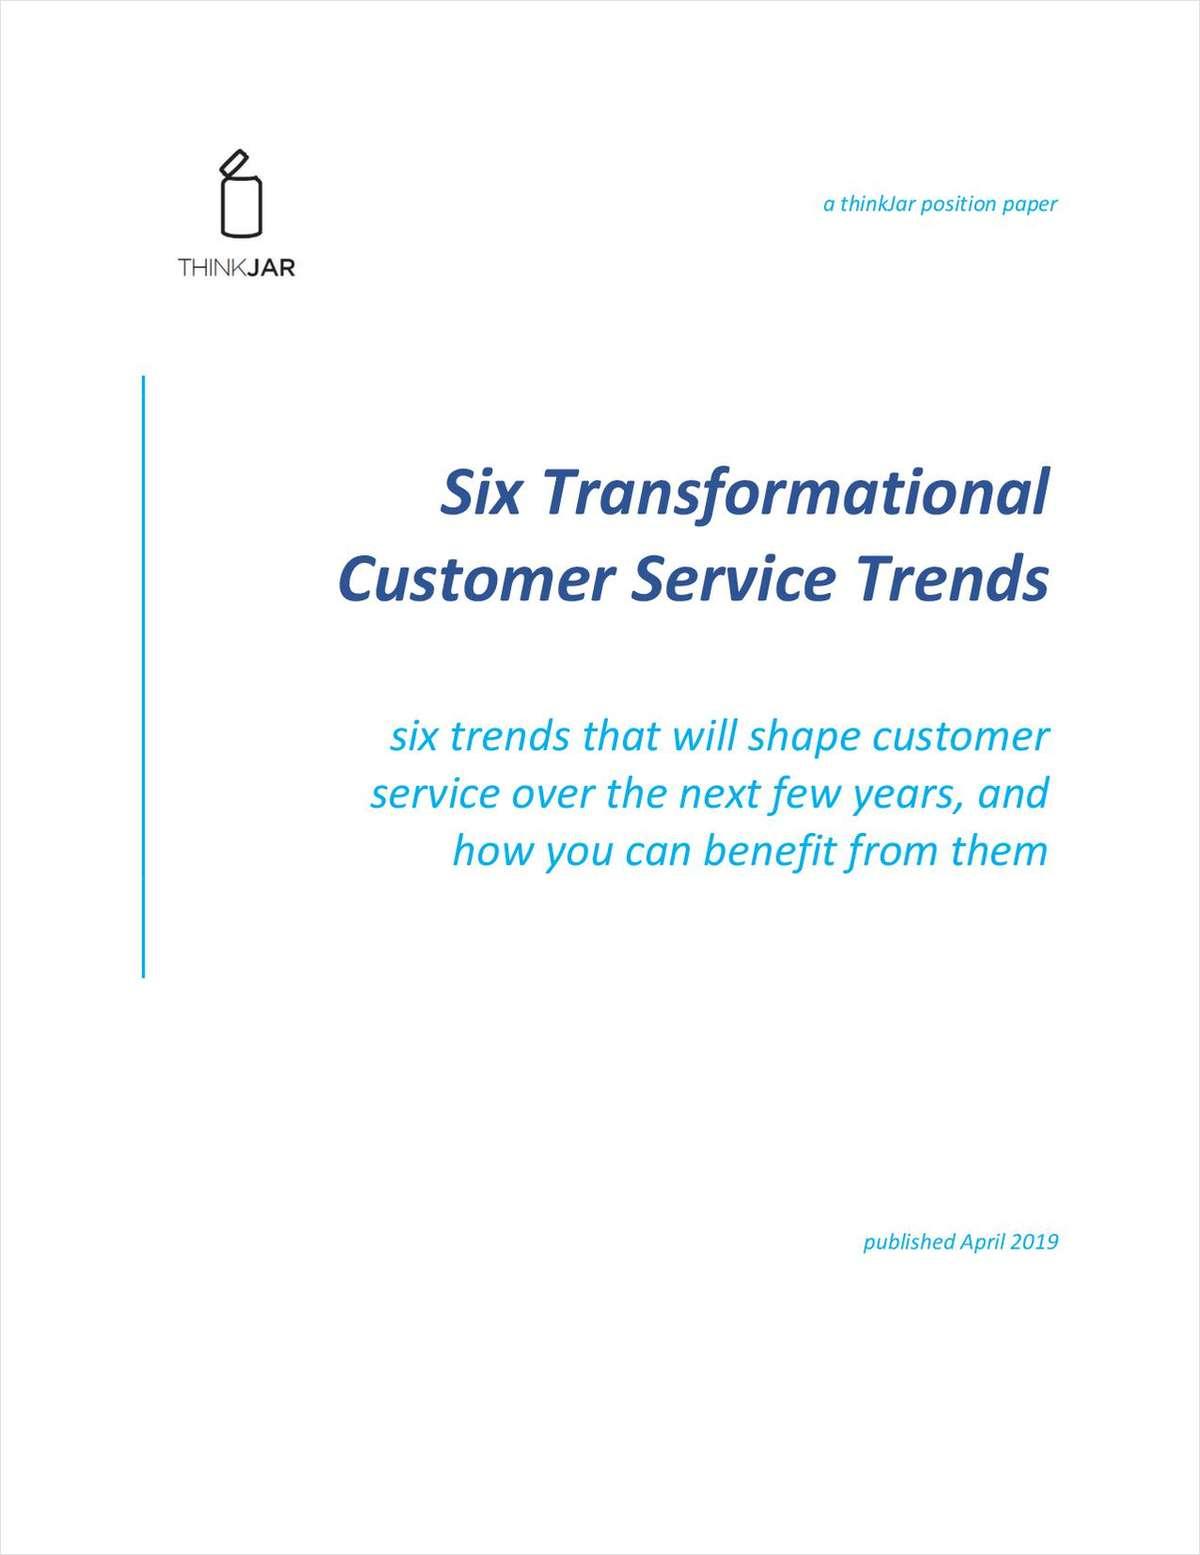 ThinkJar: Six Transformational Customer Service Trends